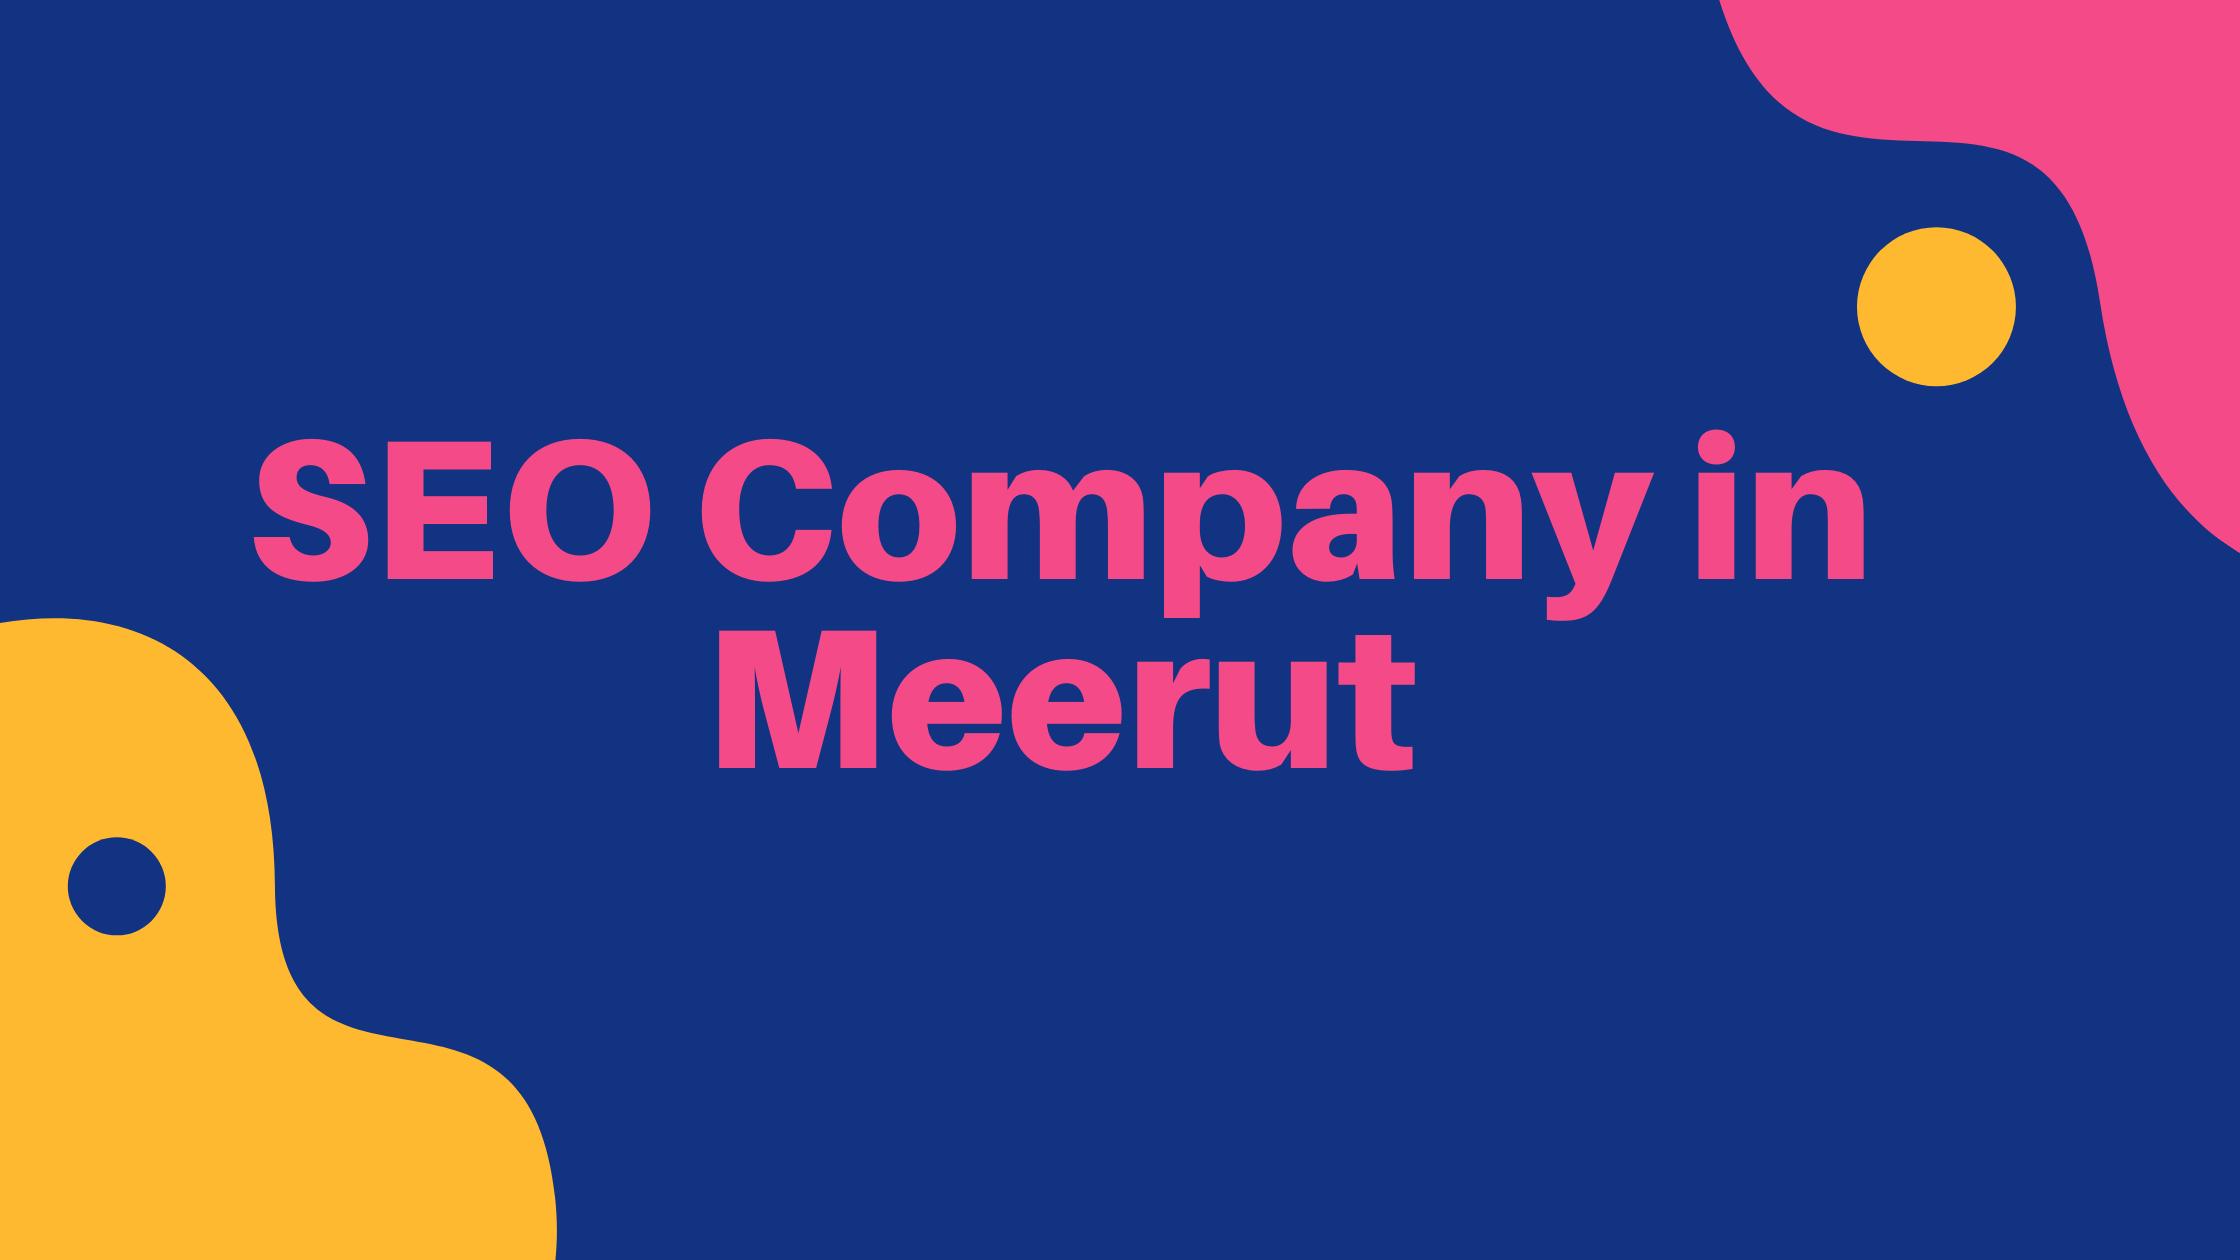 SEO company in meerut